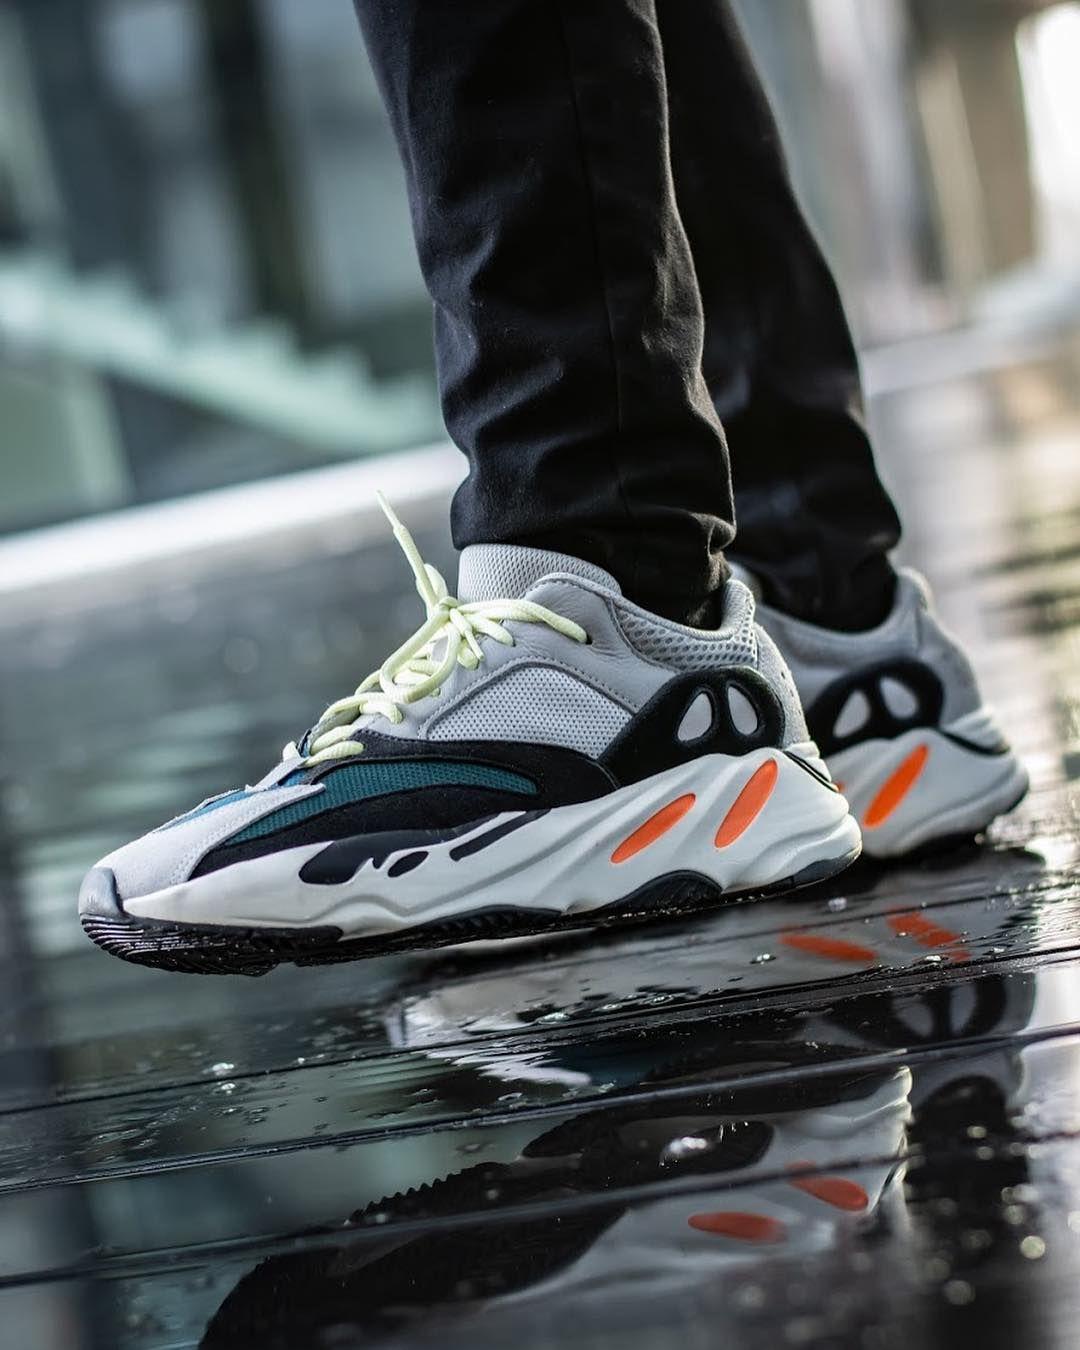 c036d393 sneakers #kicks #fashion #hypebeast #streetwear #adidas #shoes #oo ...